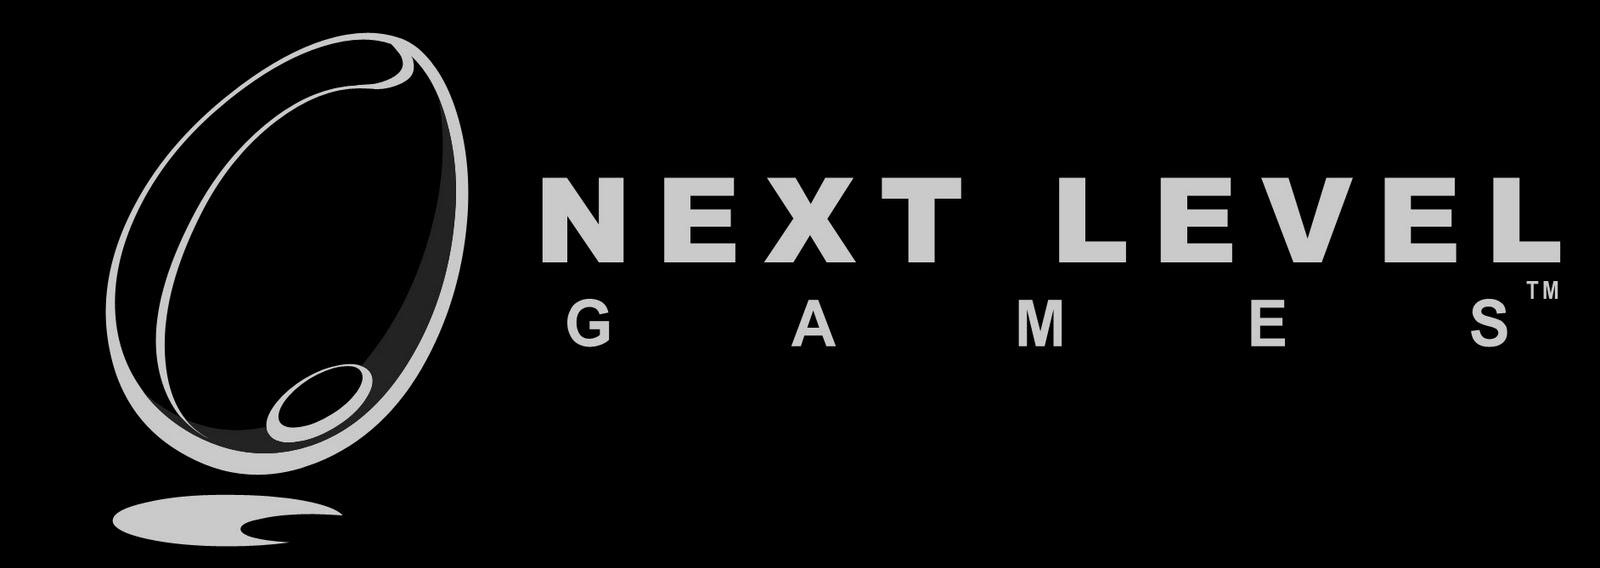 Next Level Gaming Next Level Games Inc